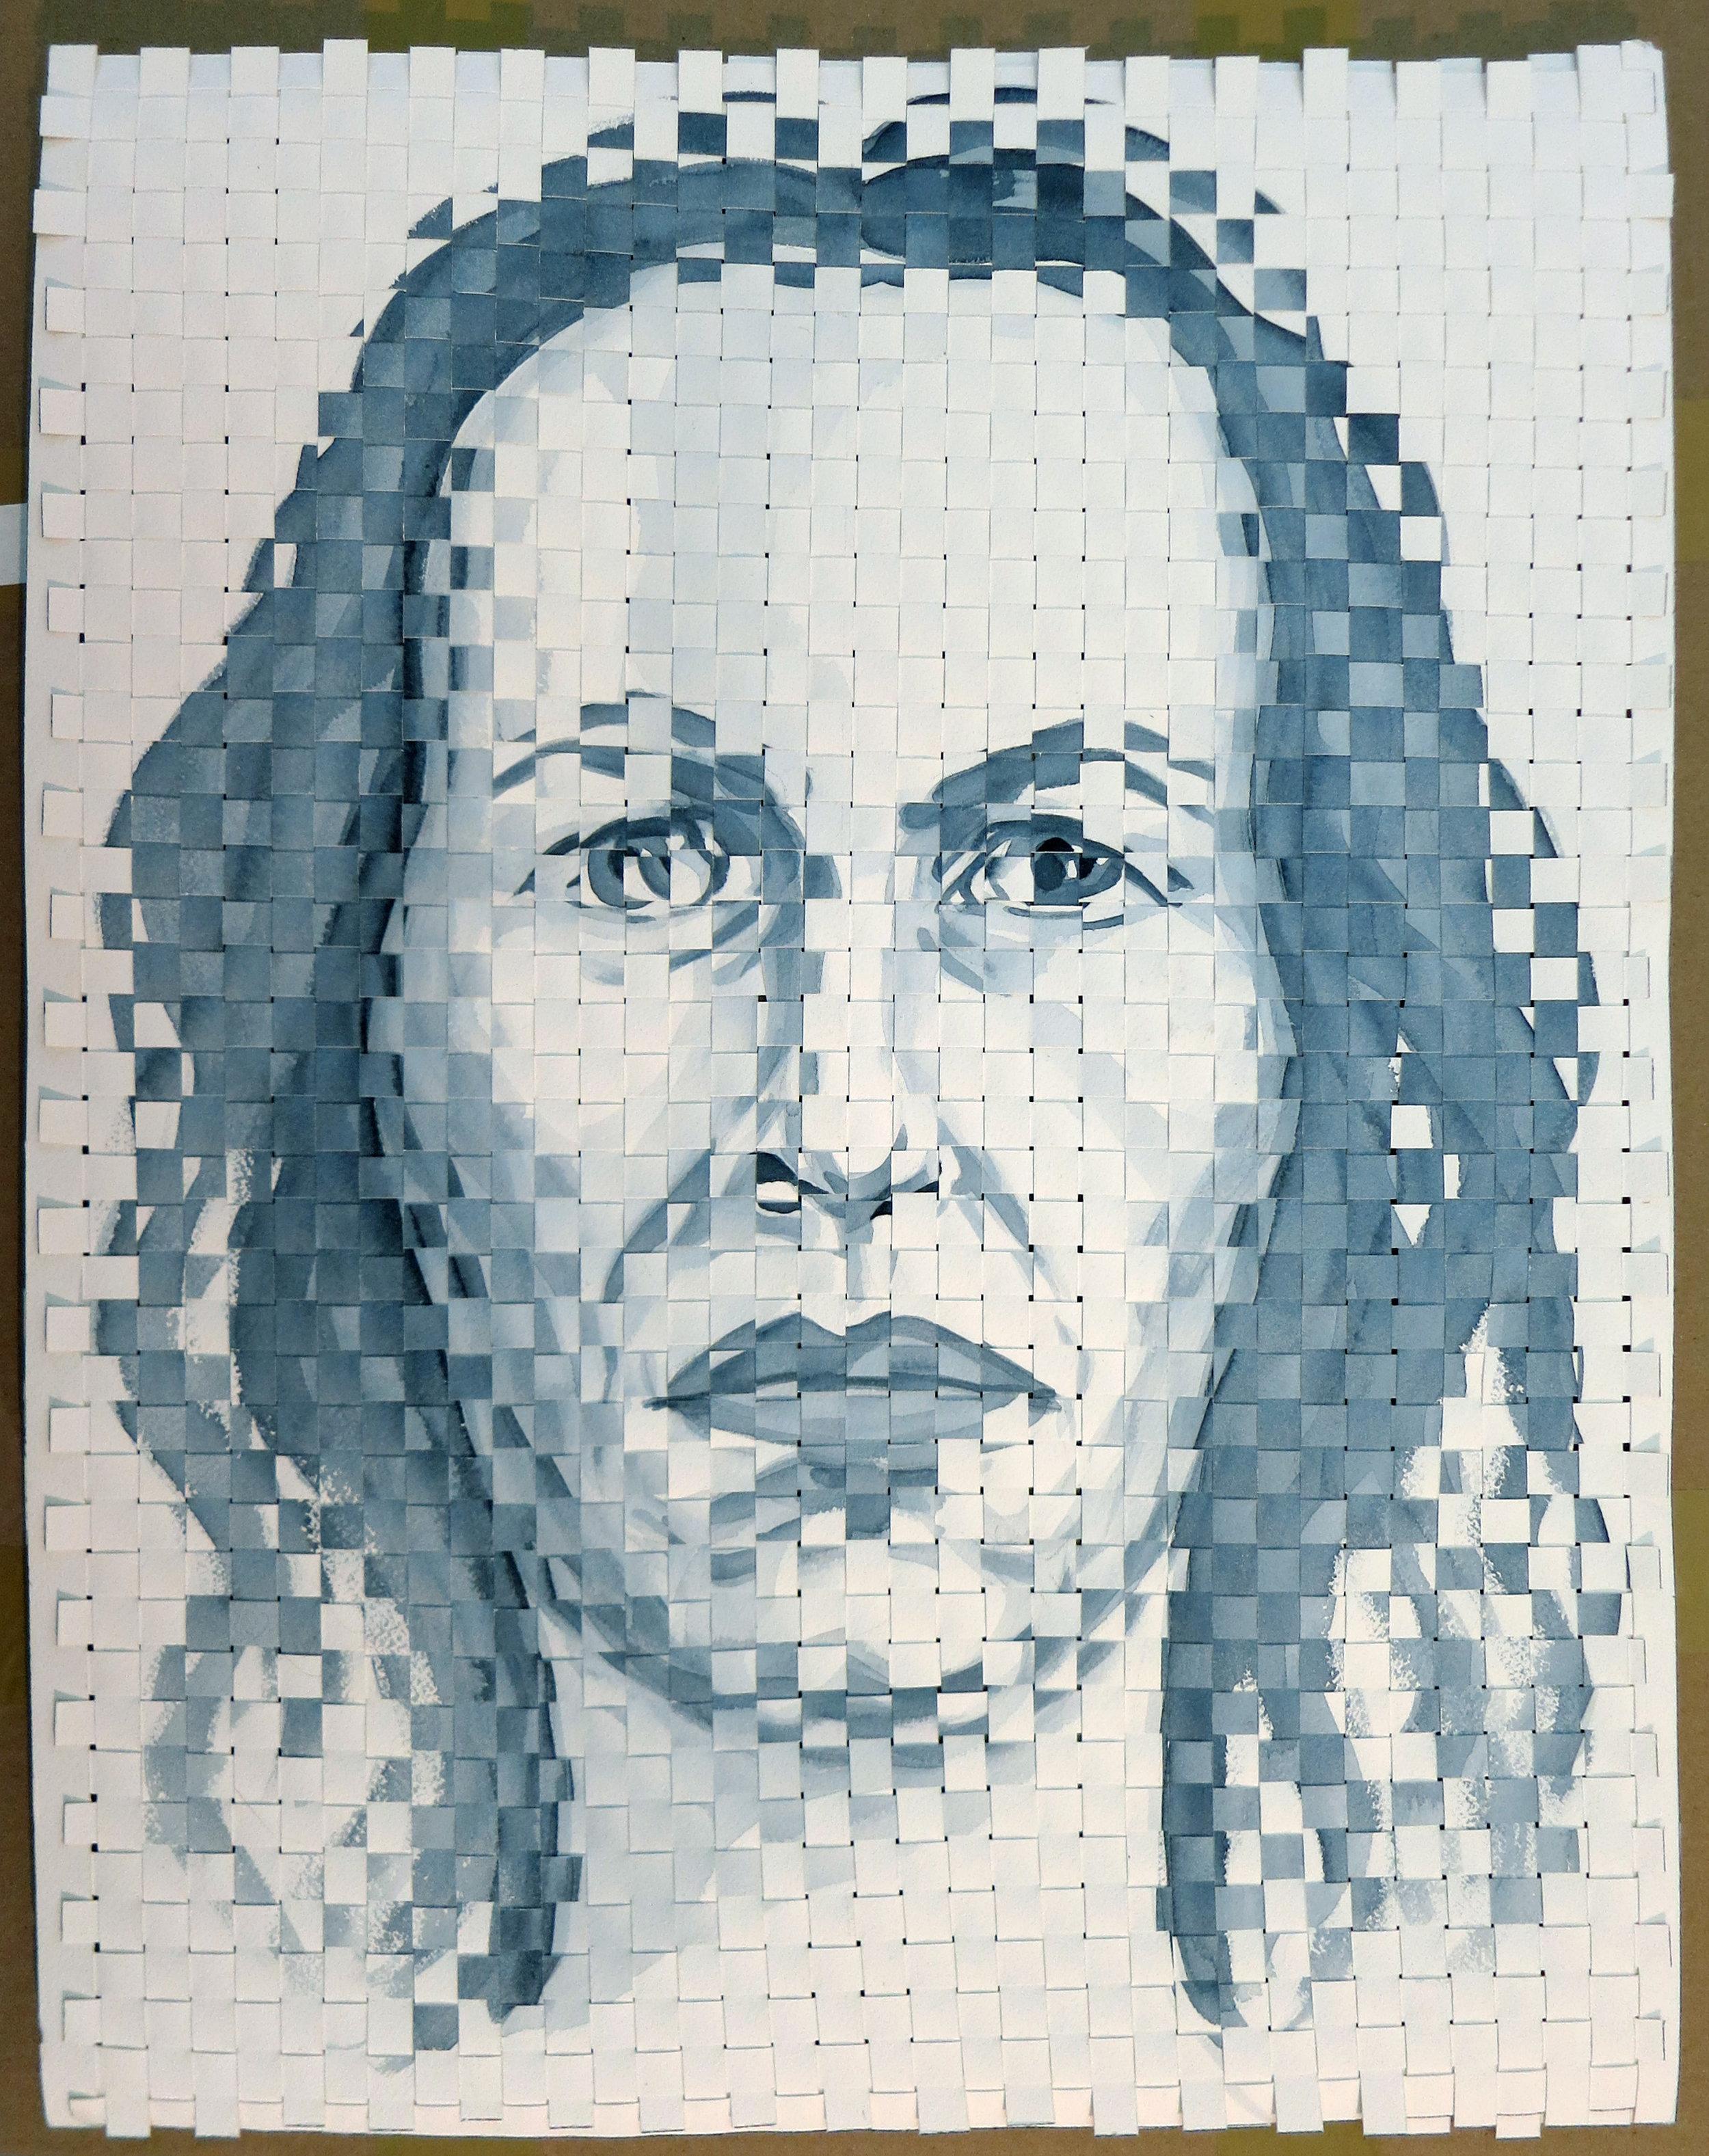 Woven Self-Portrait: monochrome